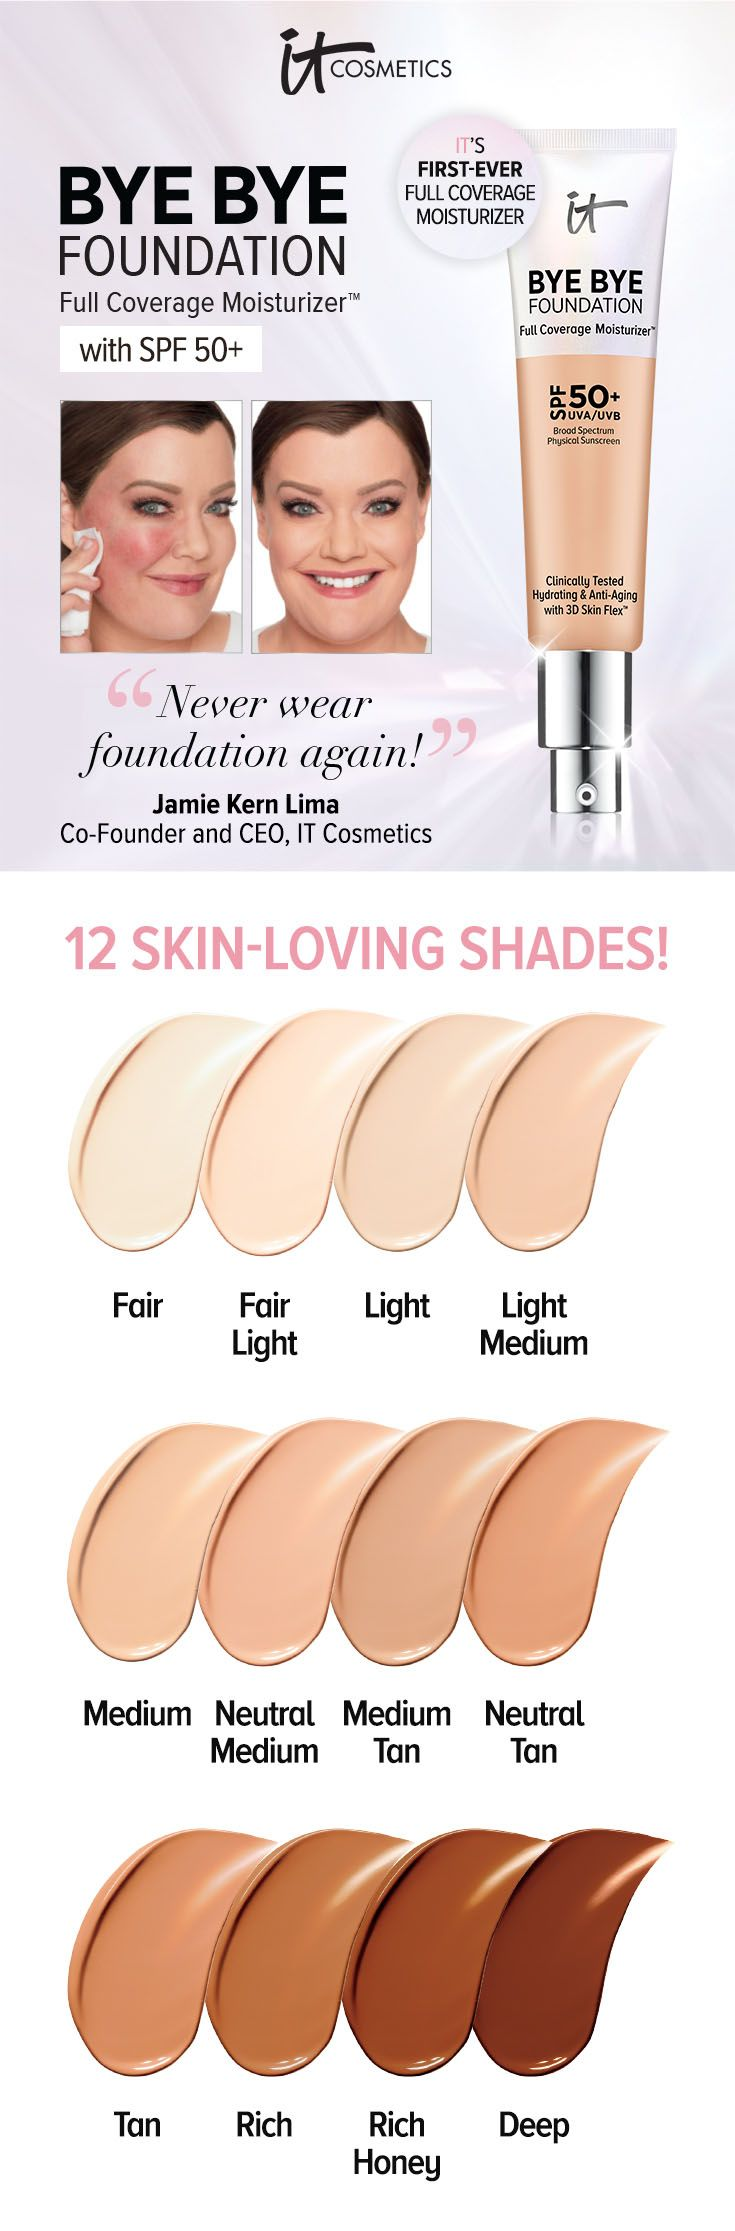 Bye Bye Foundation Full Coverage Moisturizer SPF 50+ by IT Cosmetics #9